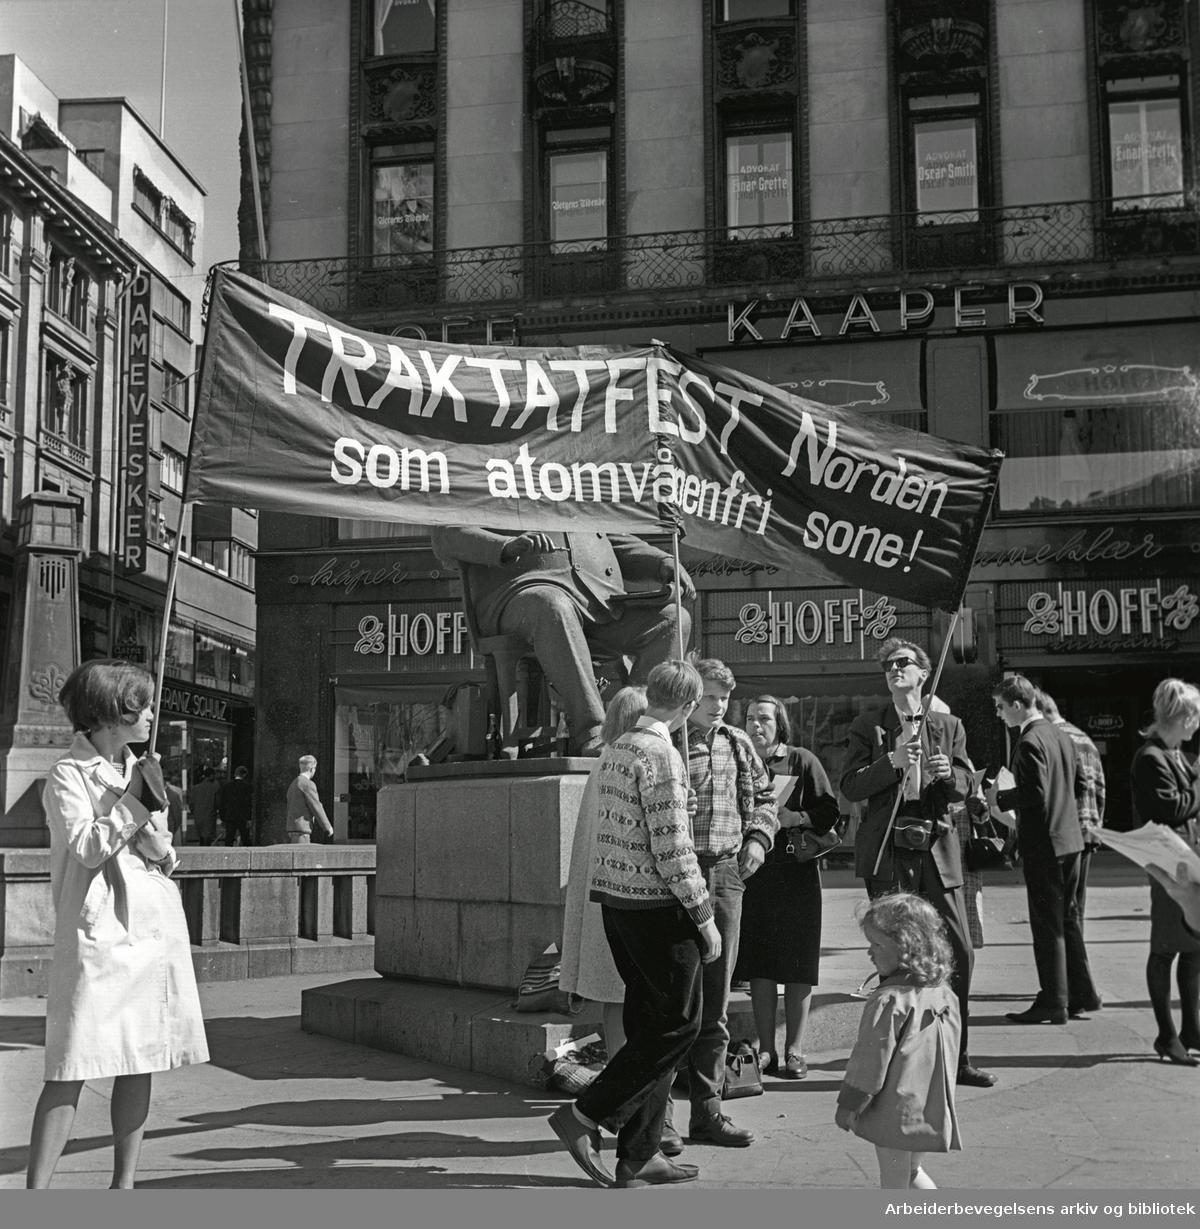 1. mai 1965 i Oslo.Kampanjen mot atomvåpen har stand på Stortings plass (Dasslokket).Parole: Traktatfest Norden som atomfri sone